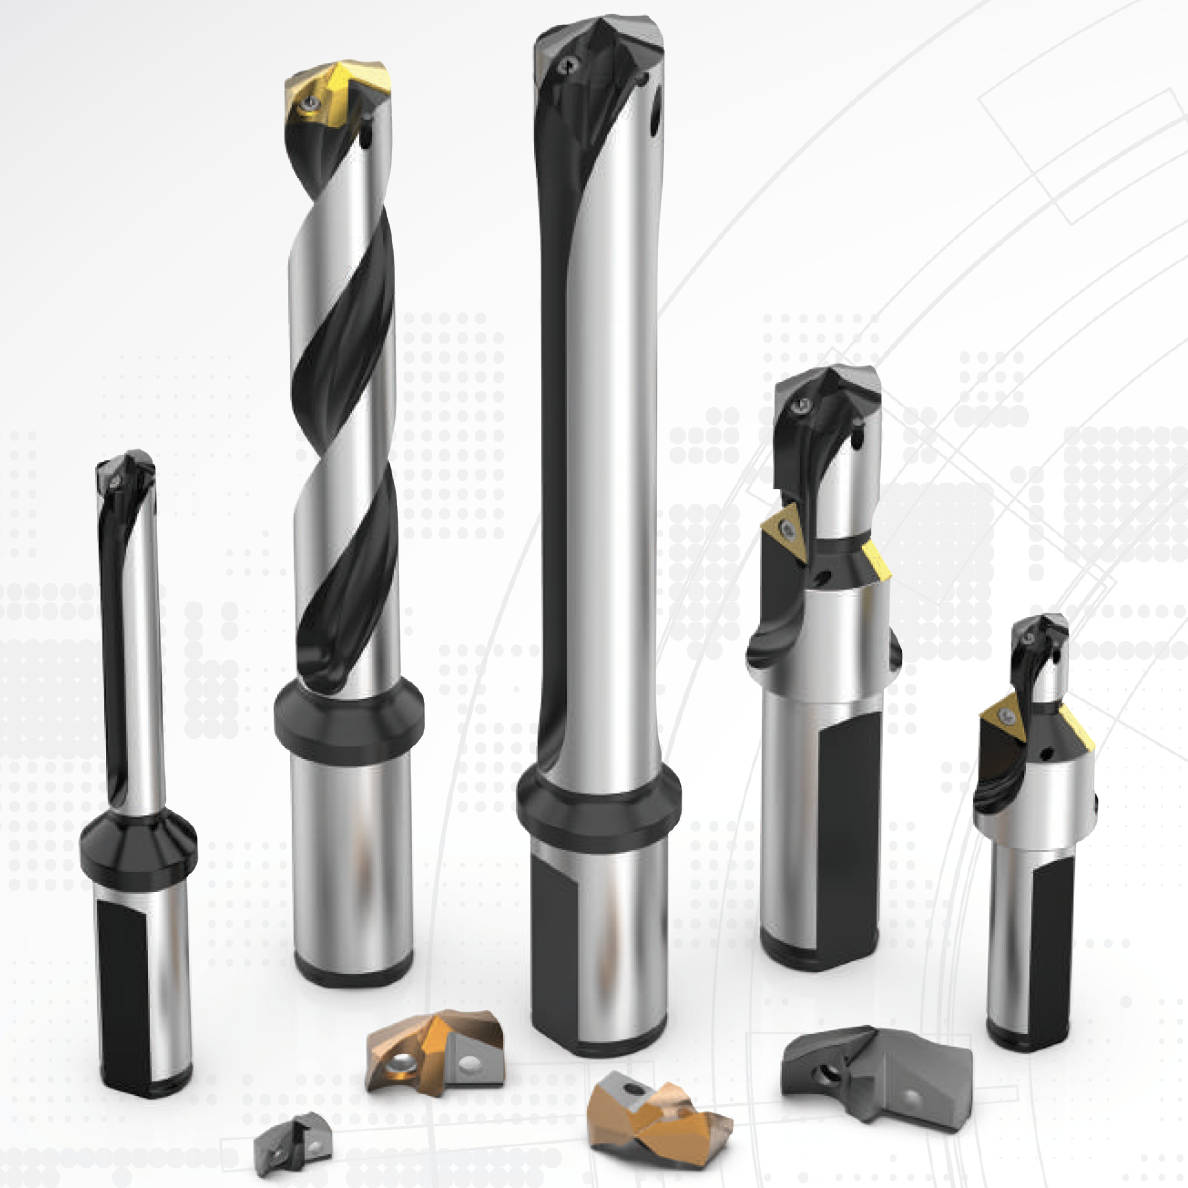 AMEC, Allied Machine Engineering Corp, Gen3sys, XT Drill, XT Pro Drill, Drill, Indexable Drill, kentip,